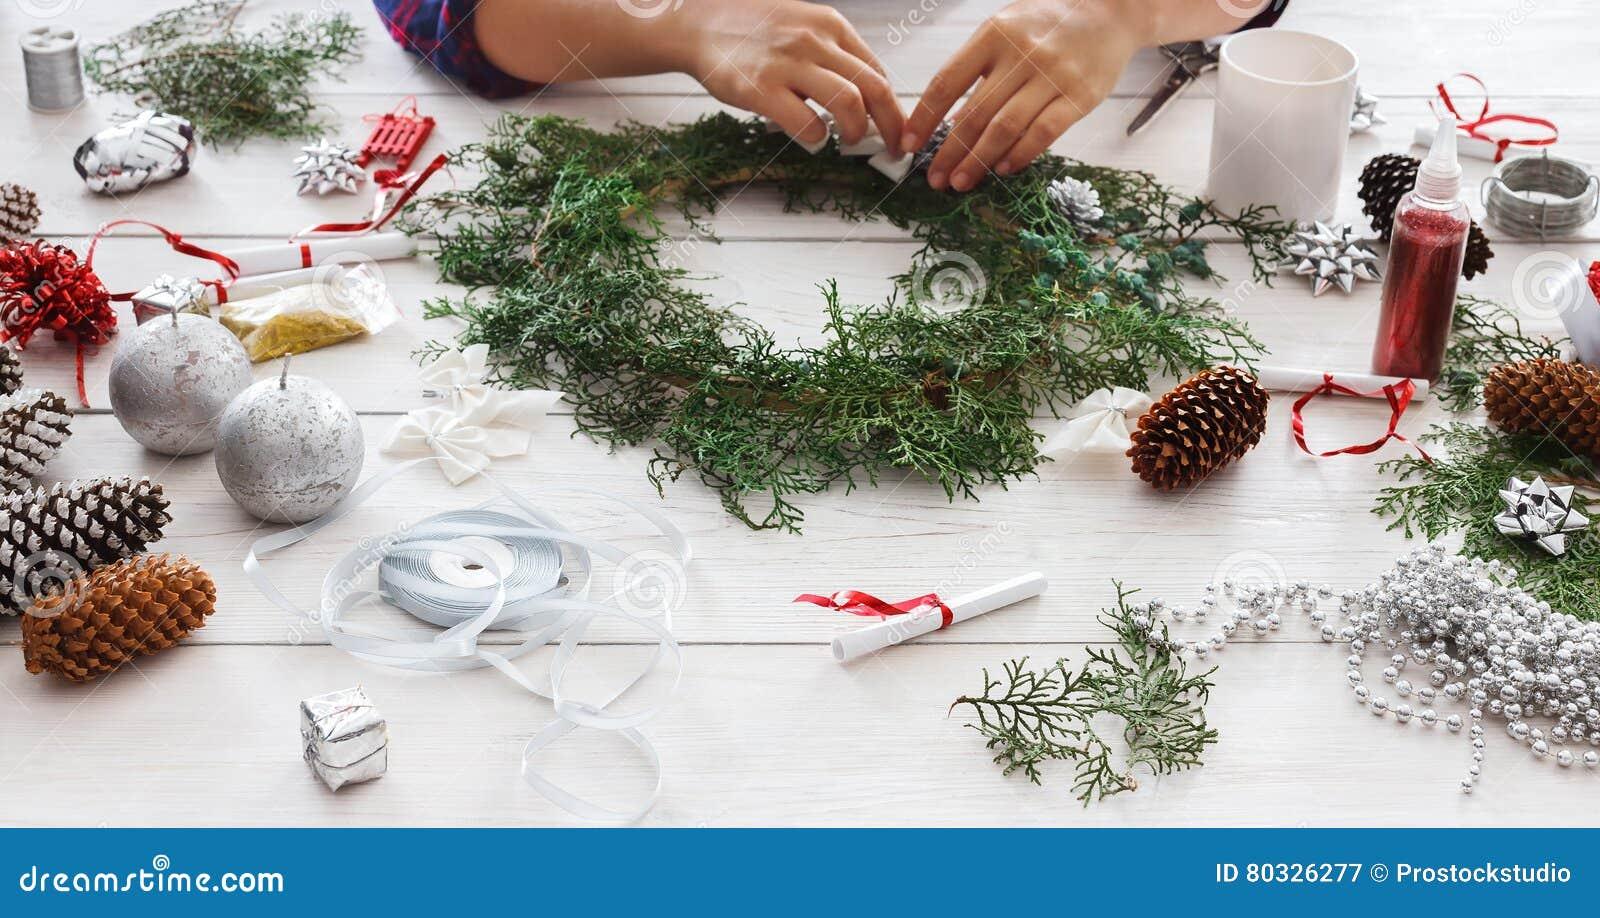 handmade craft christmas decoration ornament and garland